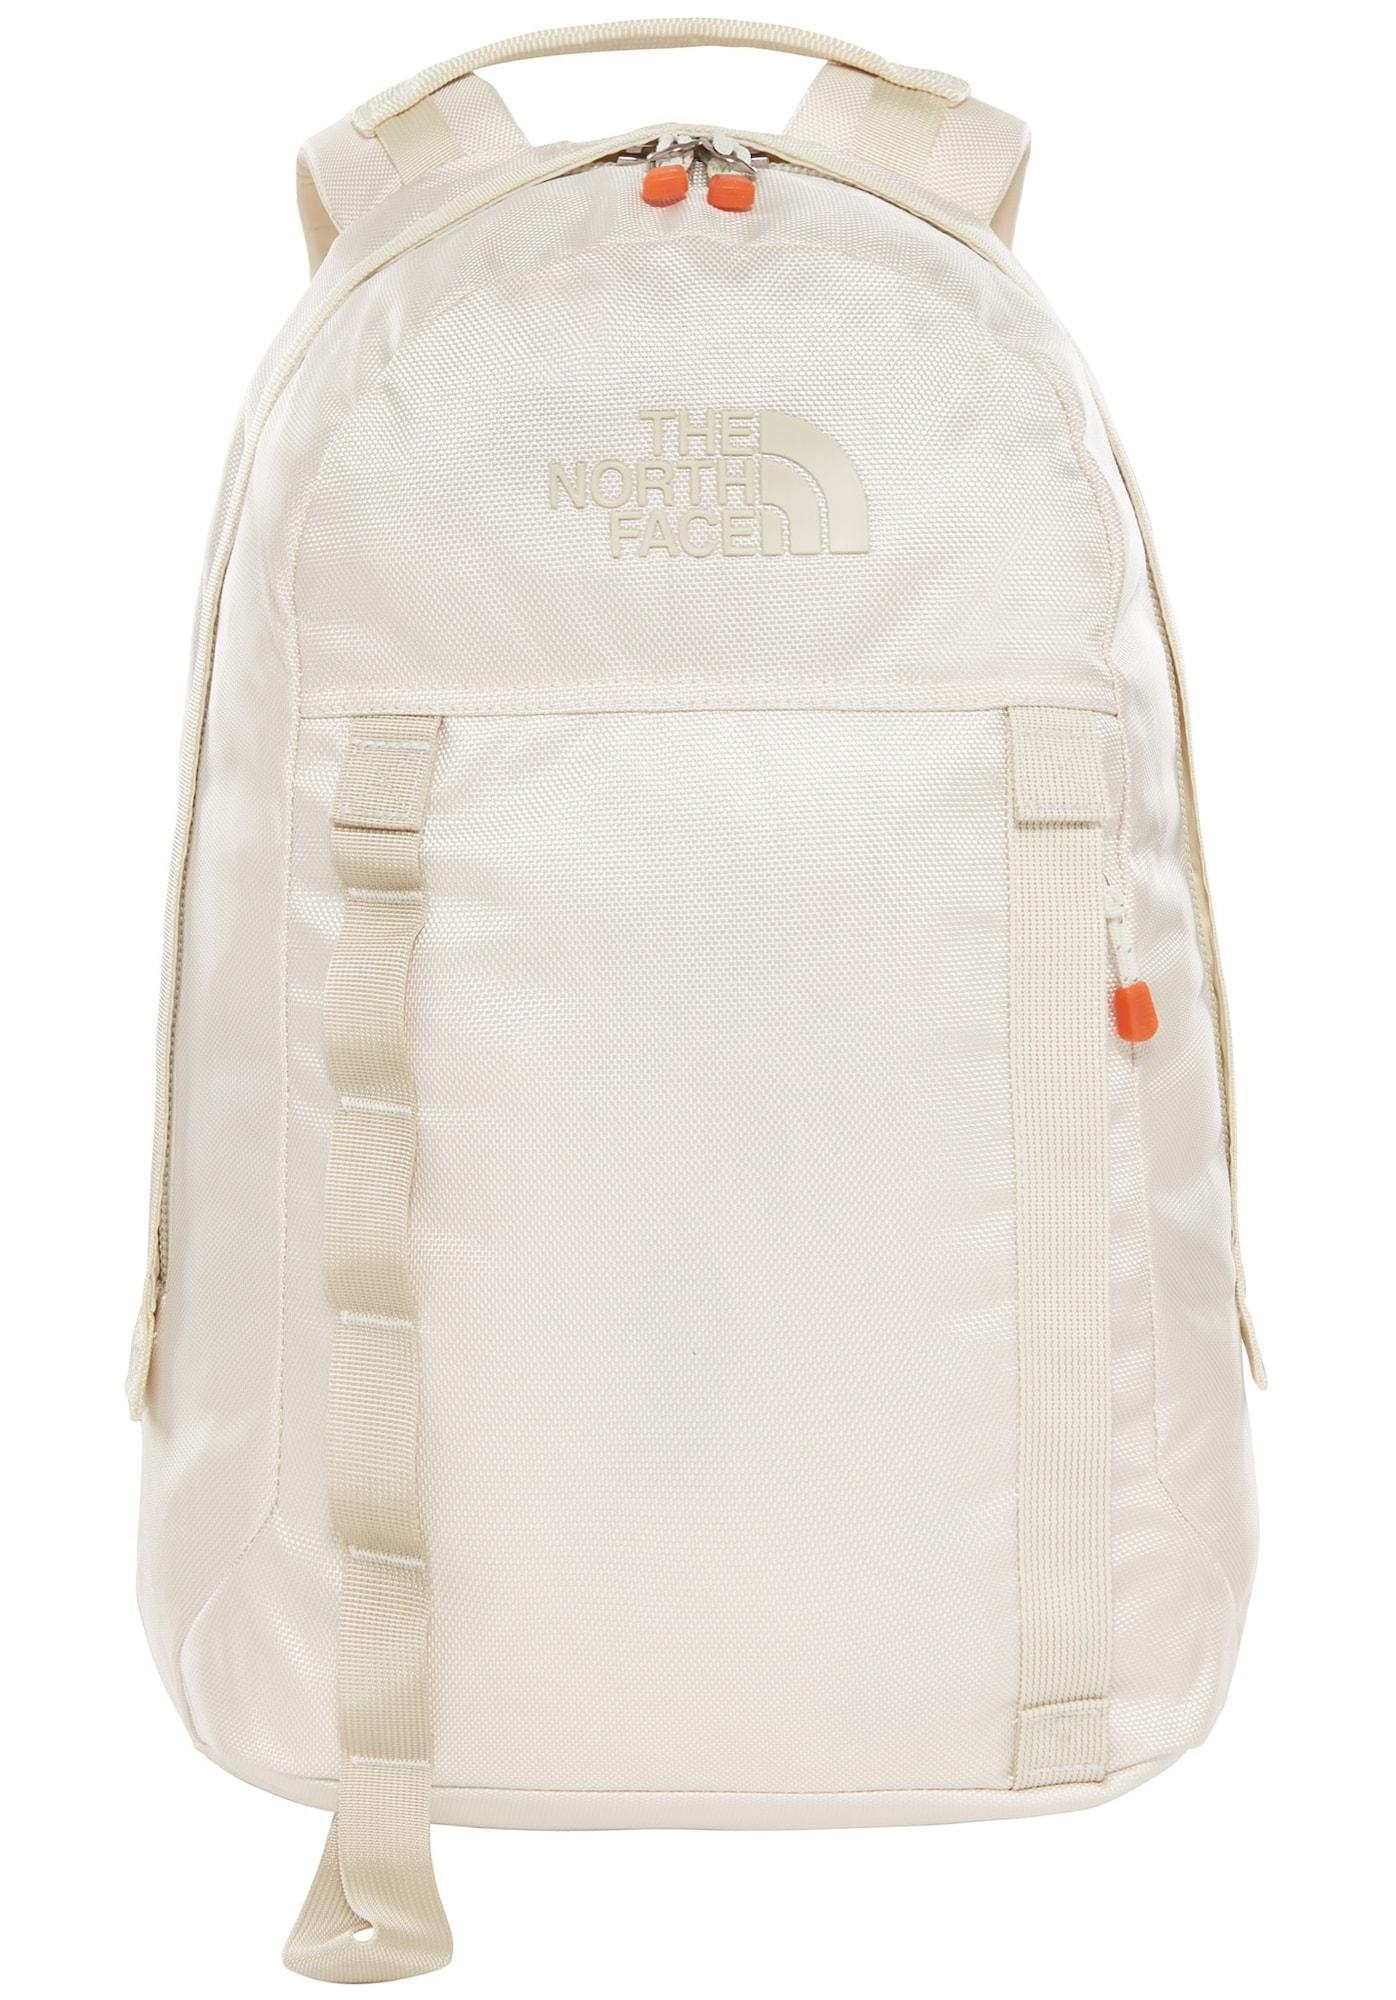 'Lineage 20' Daypack   Taschen > Rucksäcke > Tagesrucksäcke   The North Face